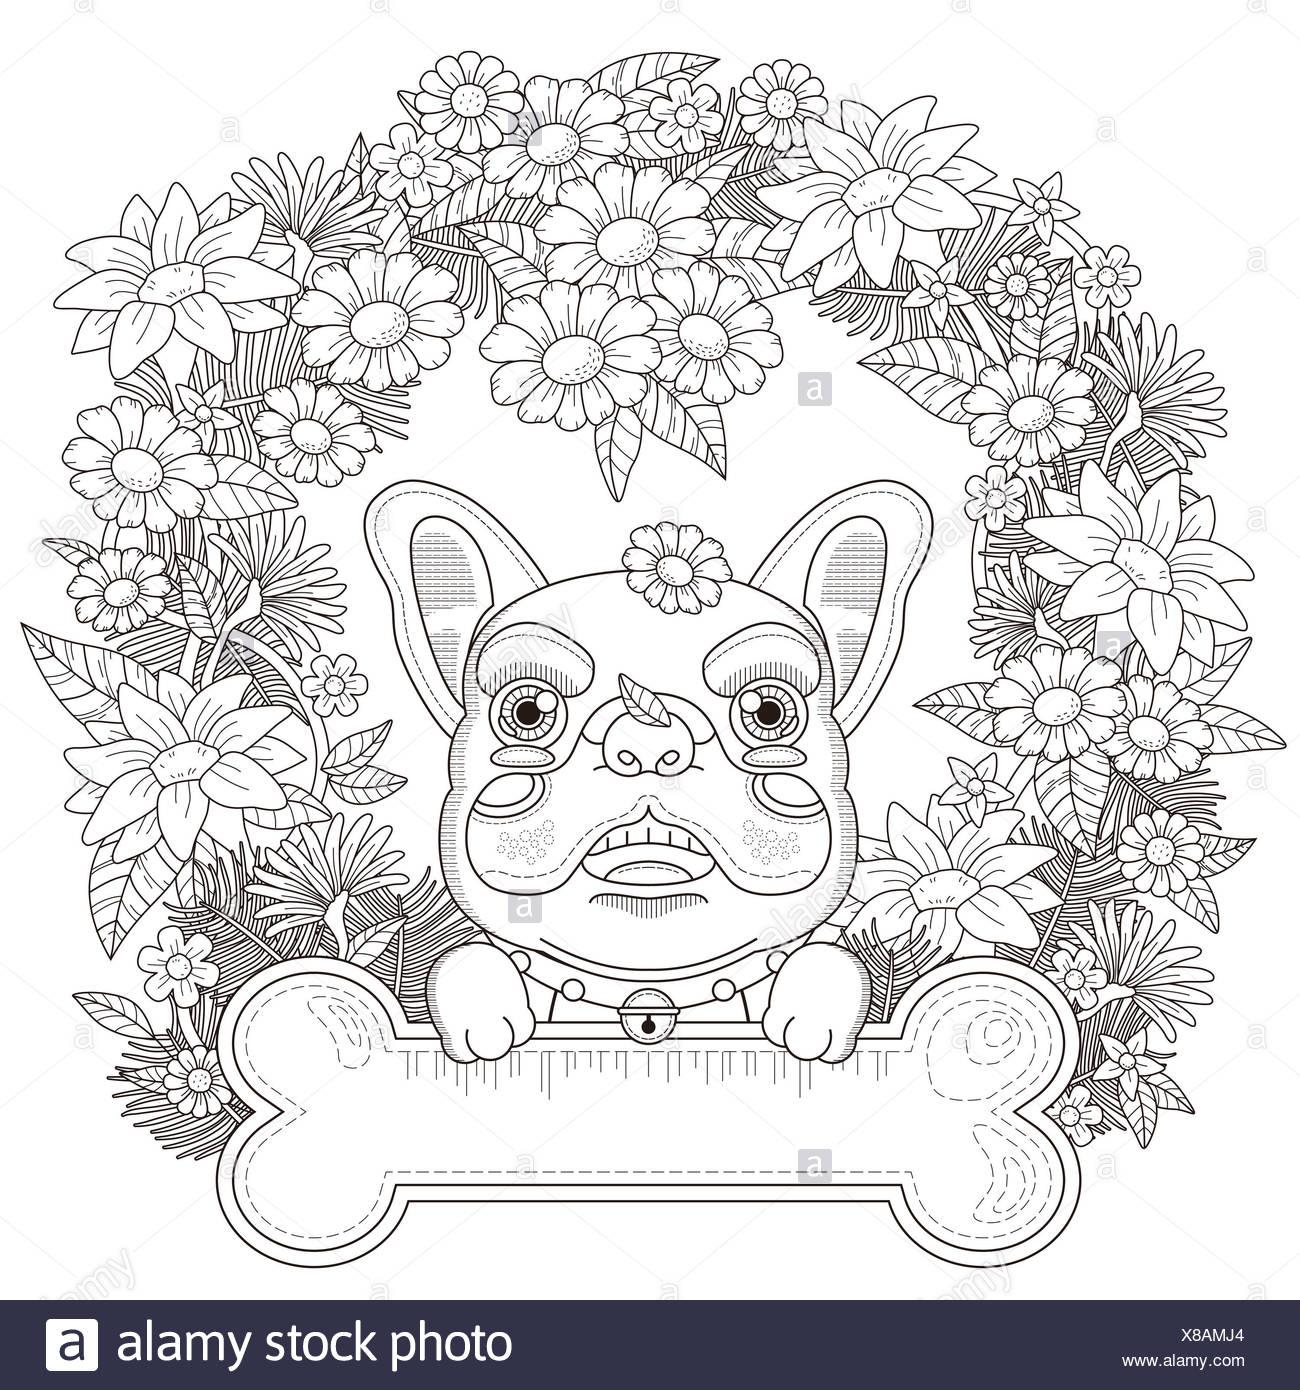 Großzügig Malvorlagen Doggy Galerie - Entry Level Resume Vorlagen ...